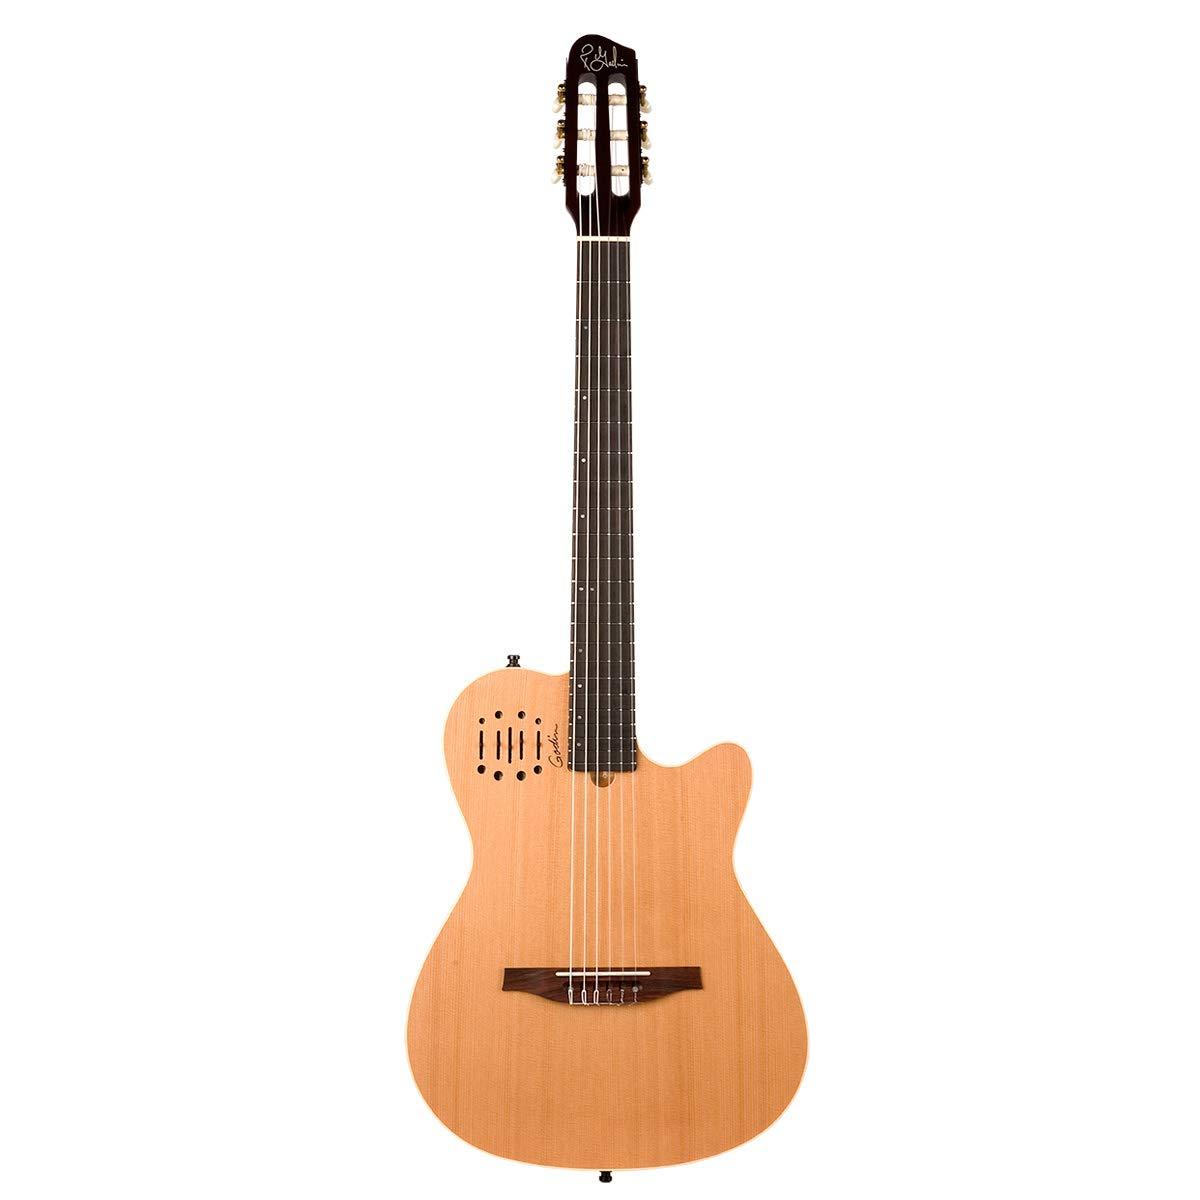 Godin Multiac Nylon Encore Acoustic Electric Classical Guitar, Natural